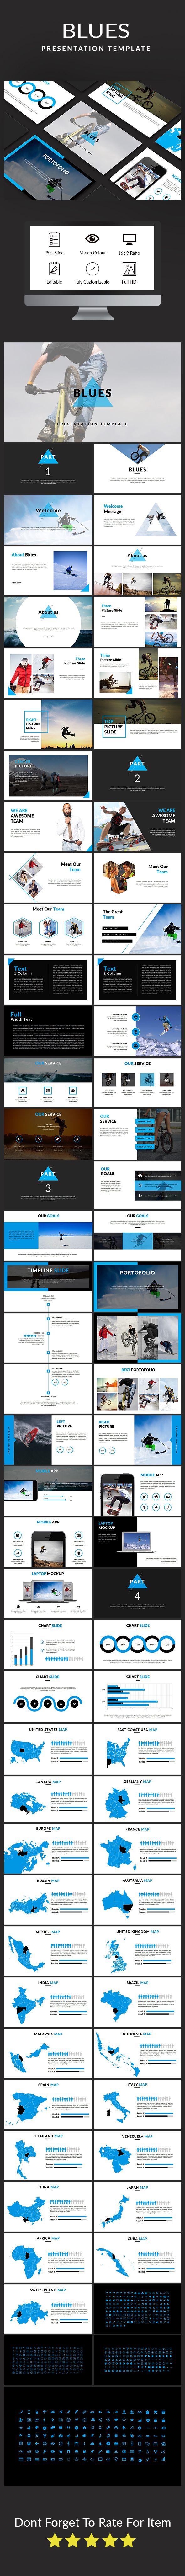 Blues Presentation Template — Keynote KEY #entrepreneur #benchmarking • Download ➝ https://graphicriver.net/item/blues-presentation-template/19438856?ref=pxcr